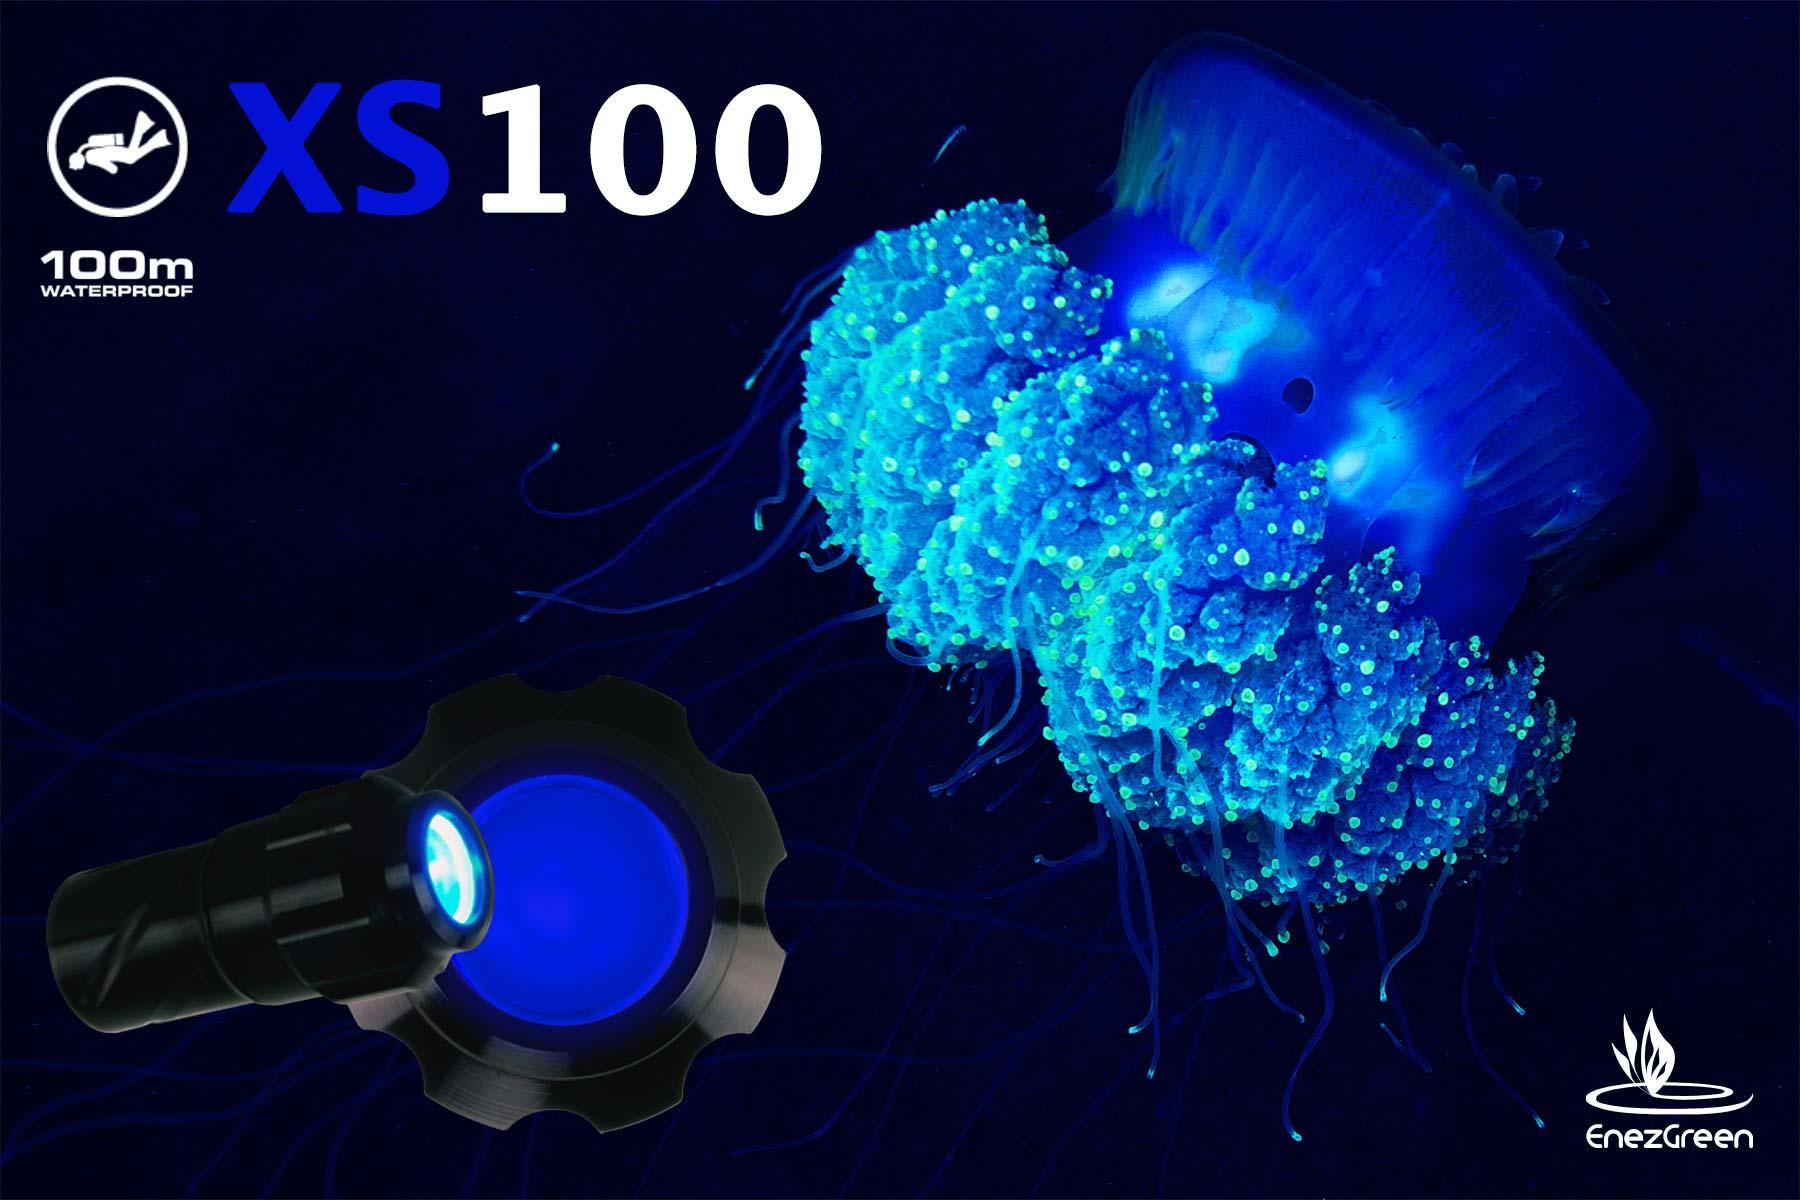 Mini lampe torche xs100 lampe plongée sous marine